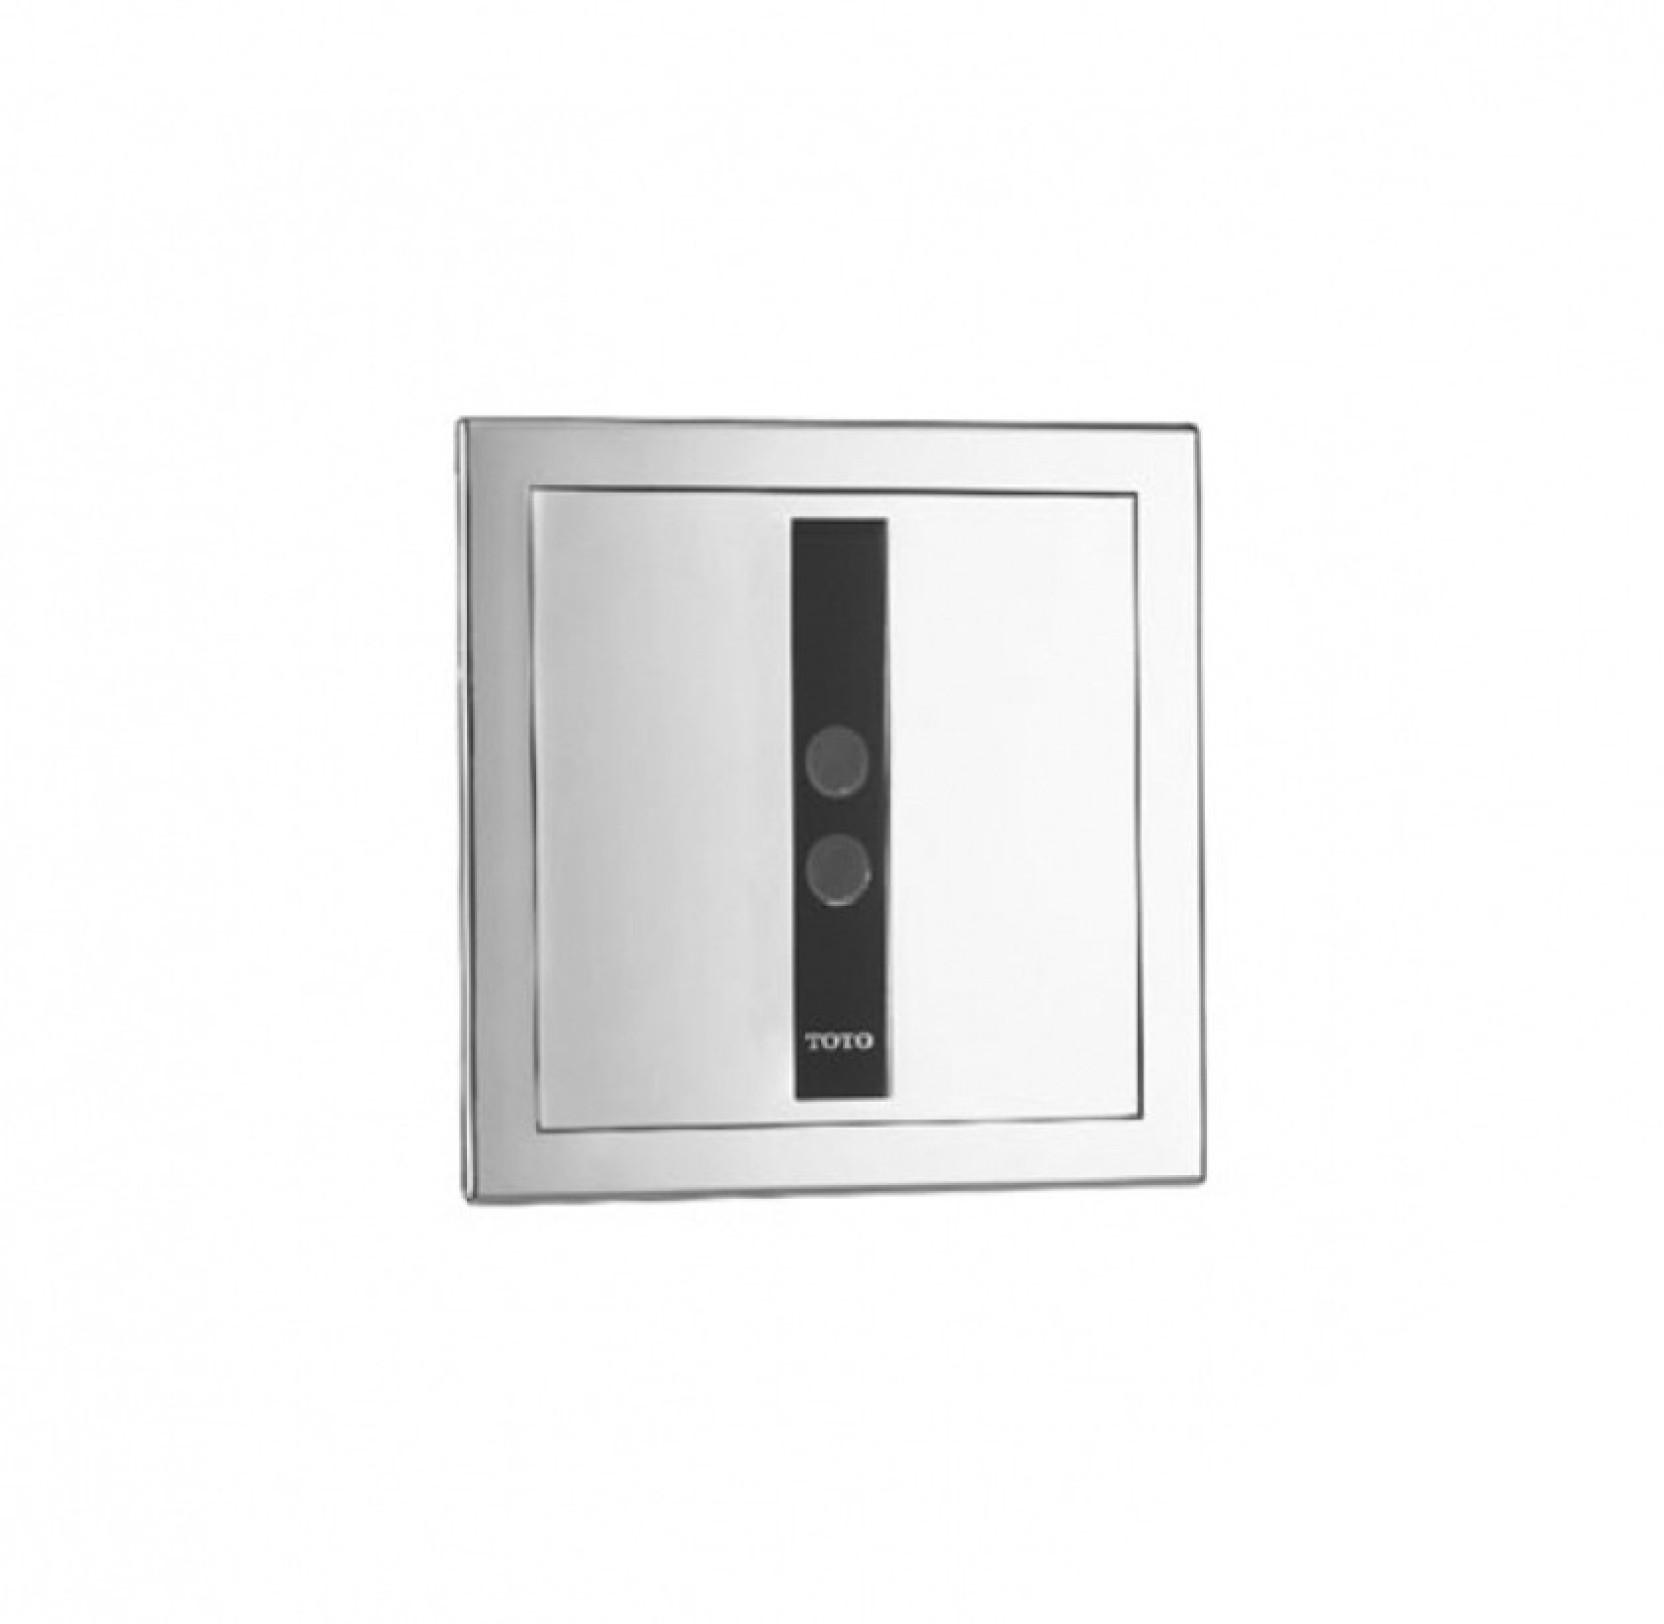 Toto DUE106UEPA Sensor Fv-For Urinalconcealed Urinal Sensor Flush ...